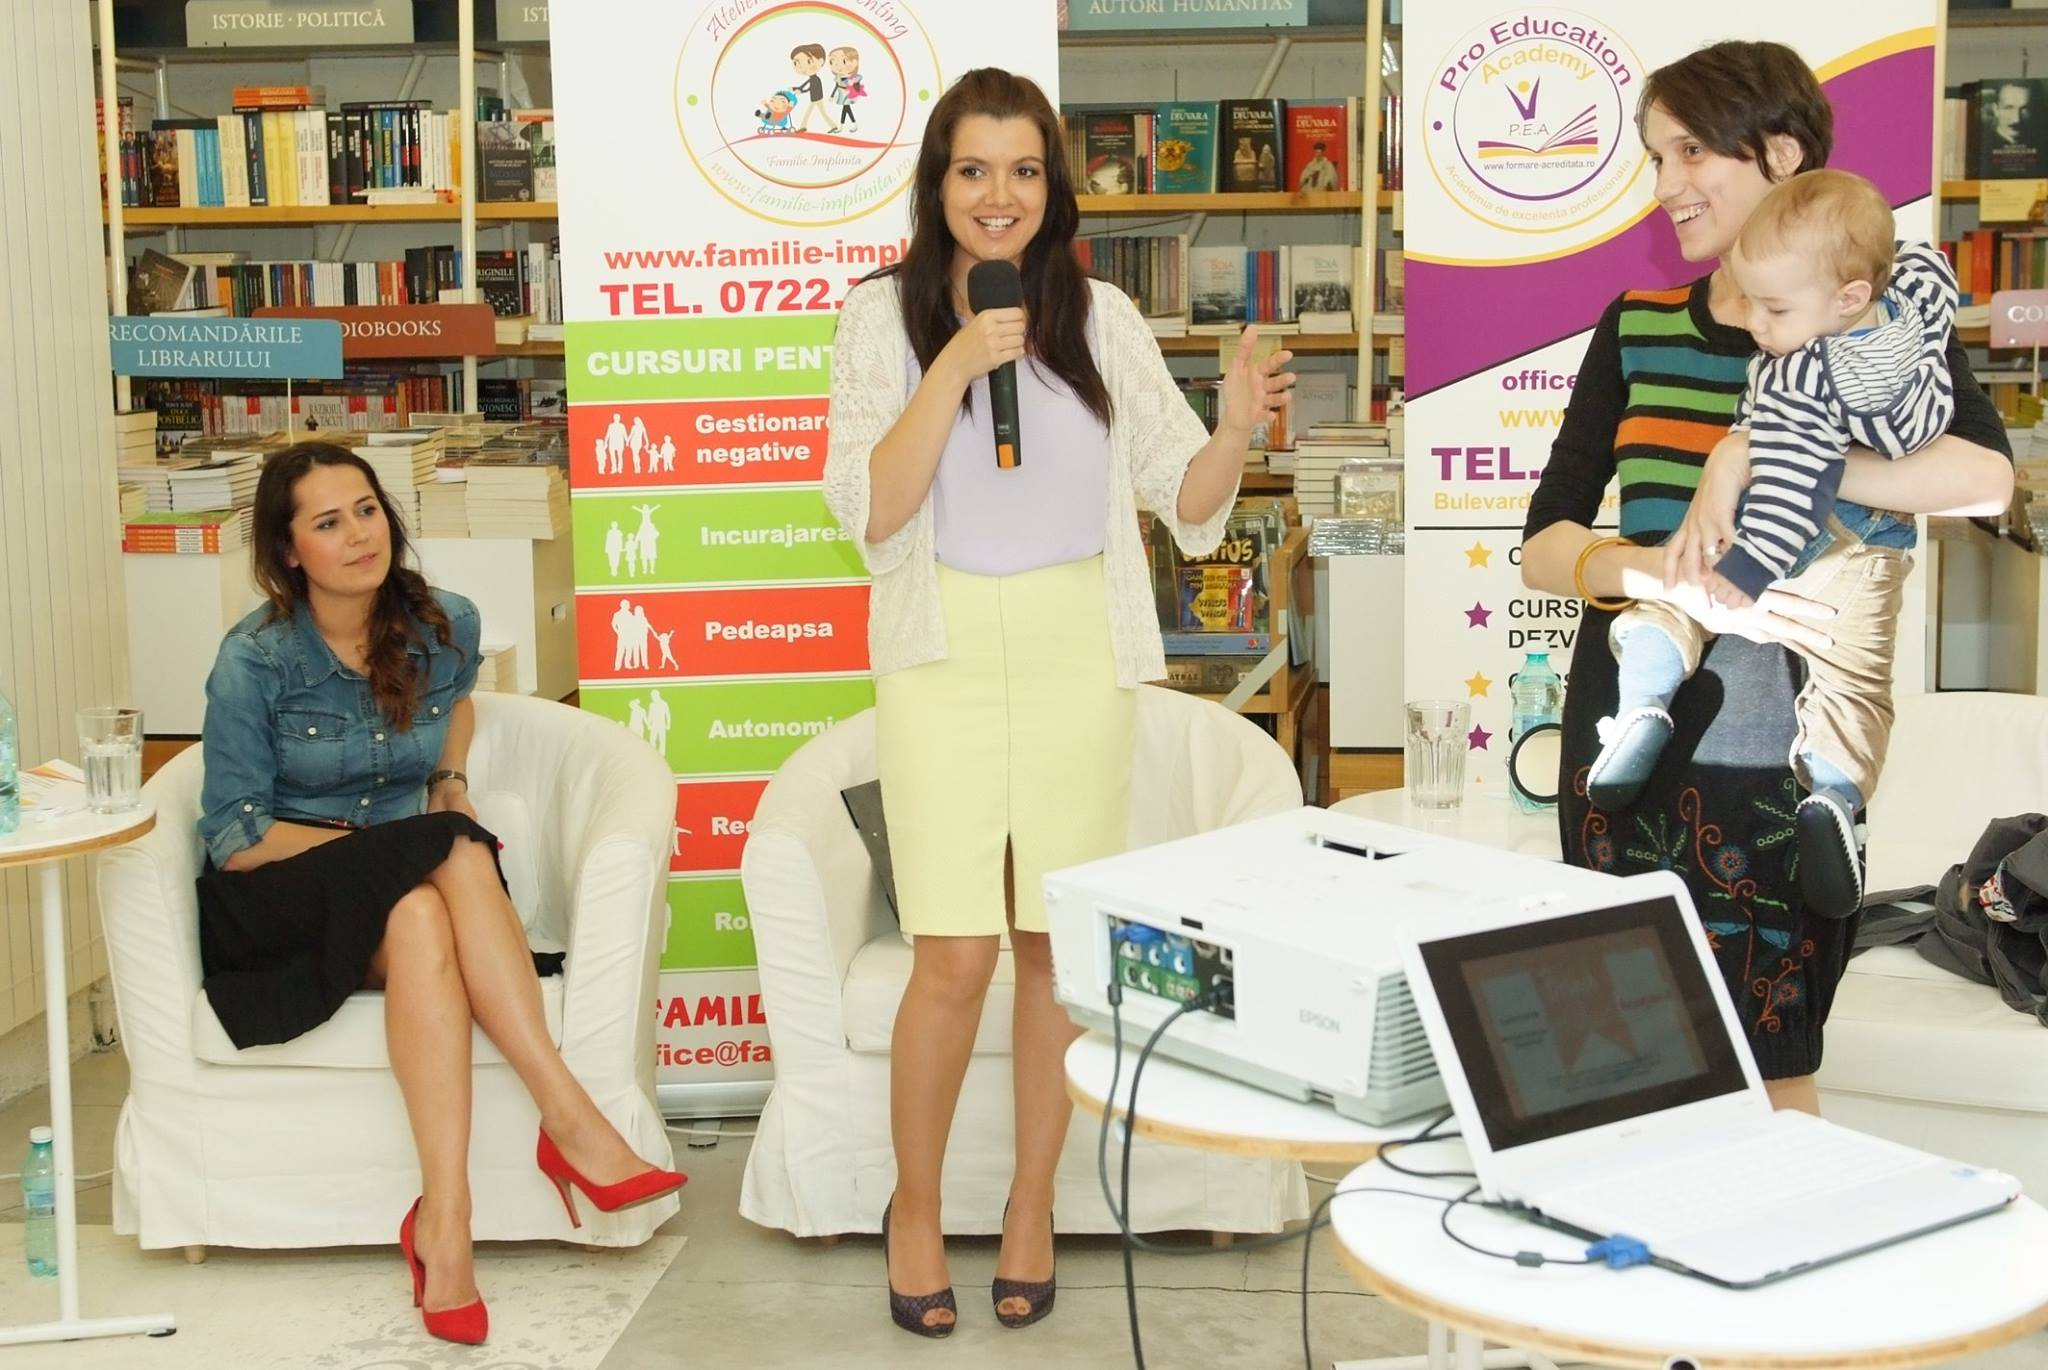 Brunch pro educatie cu Gabriela Maalouf 4